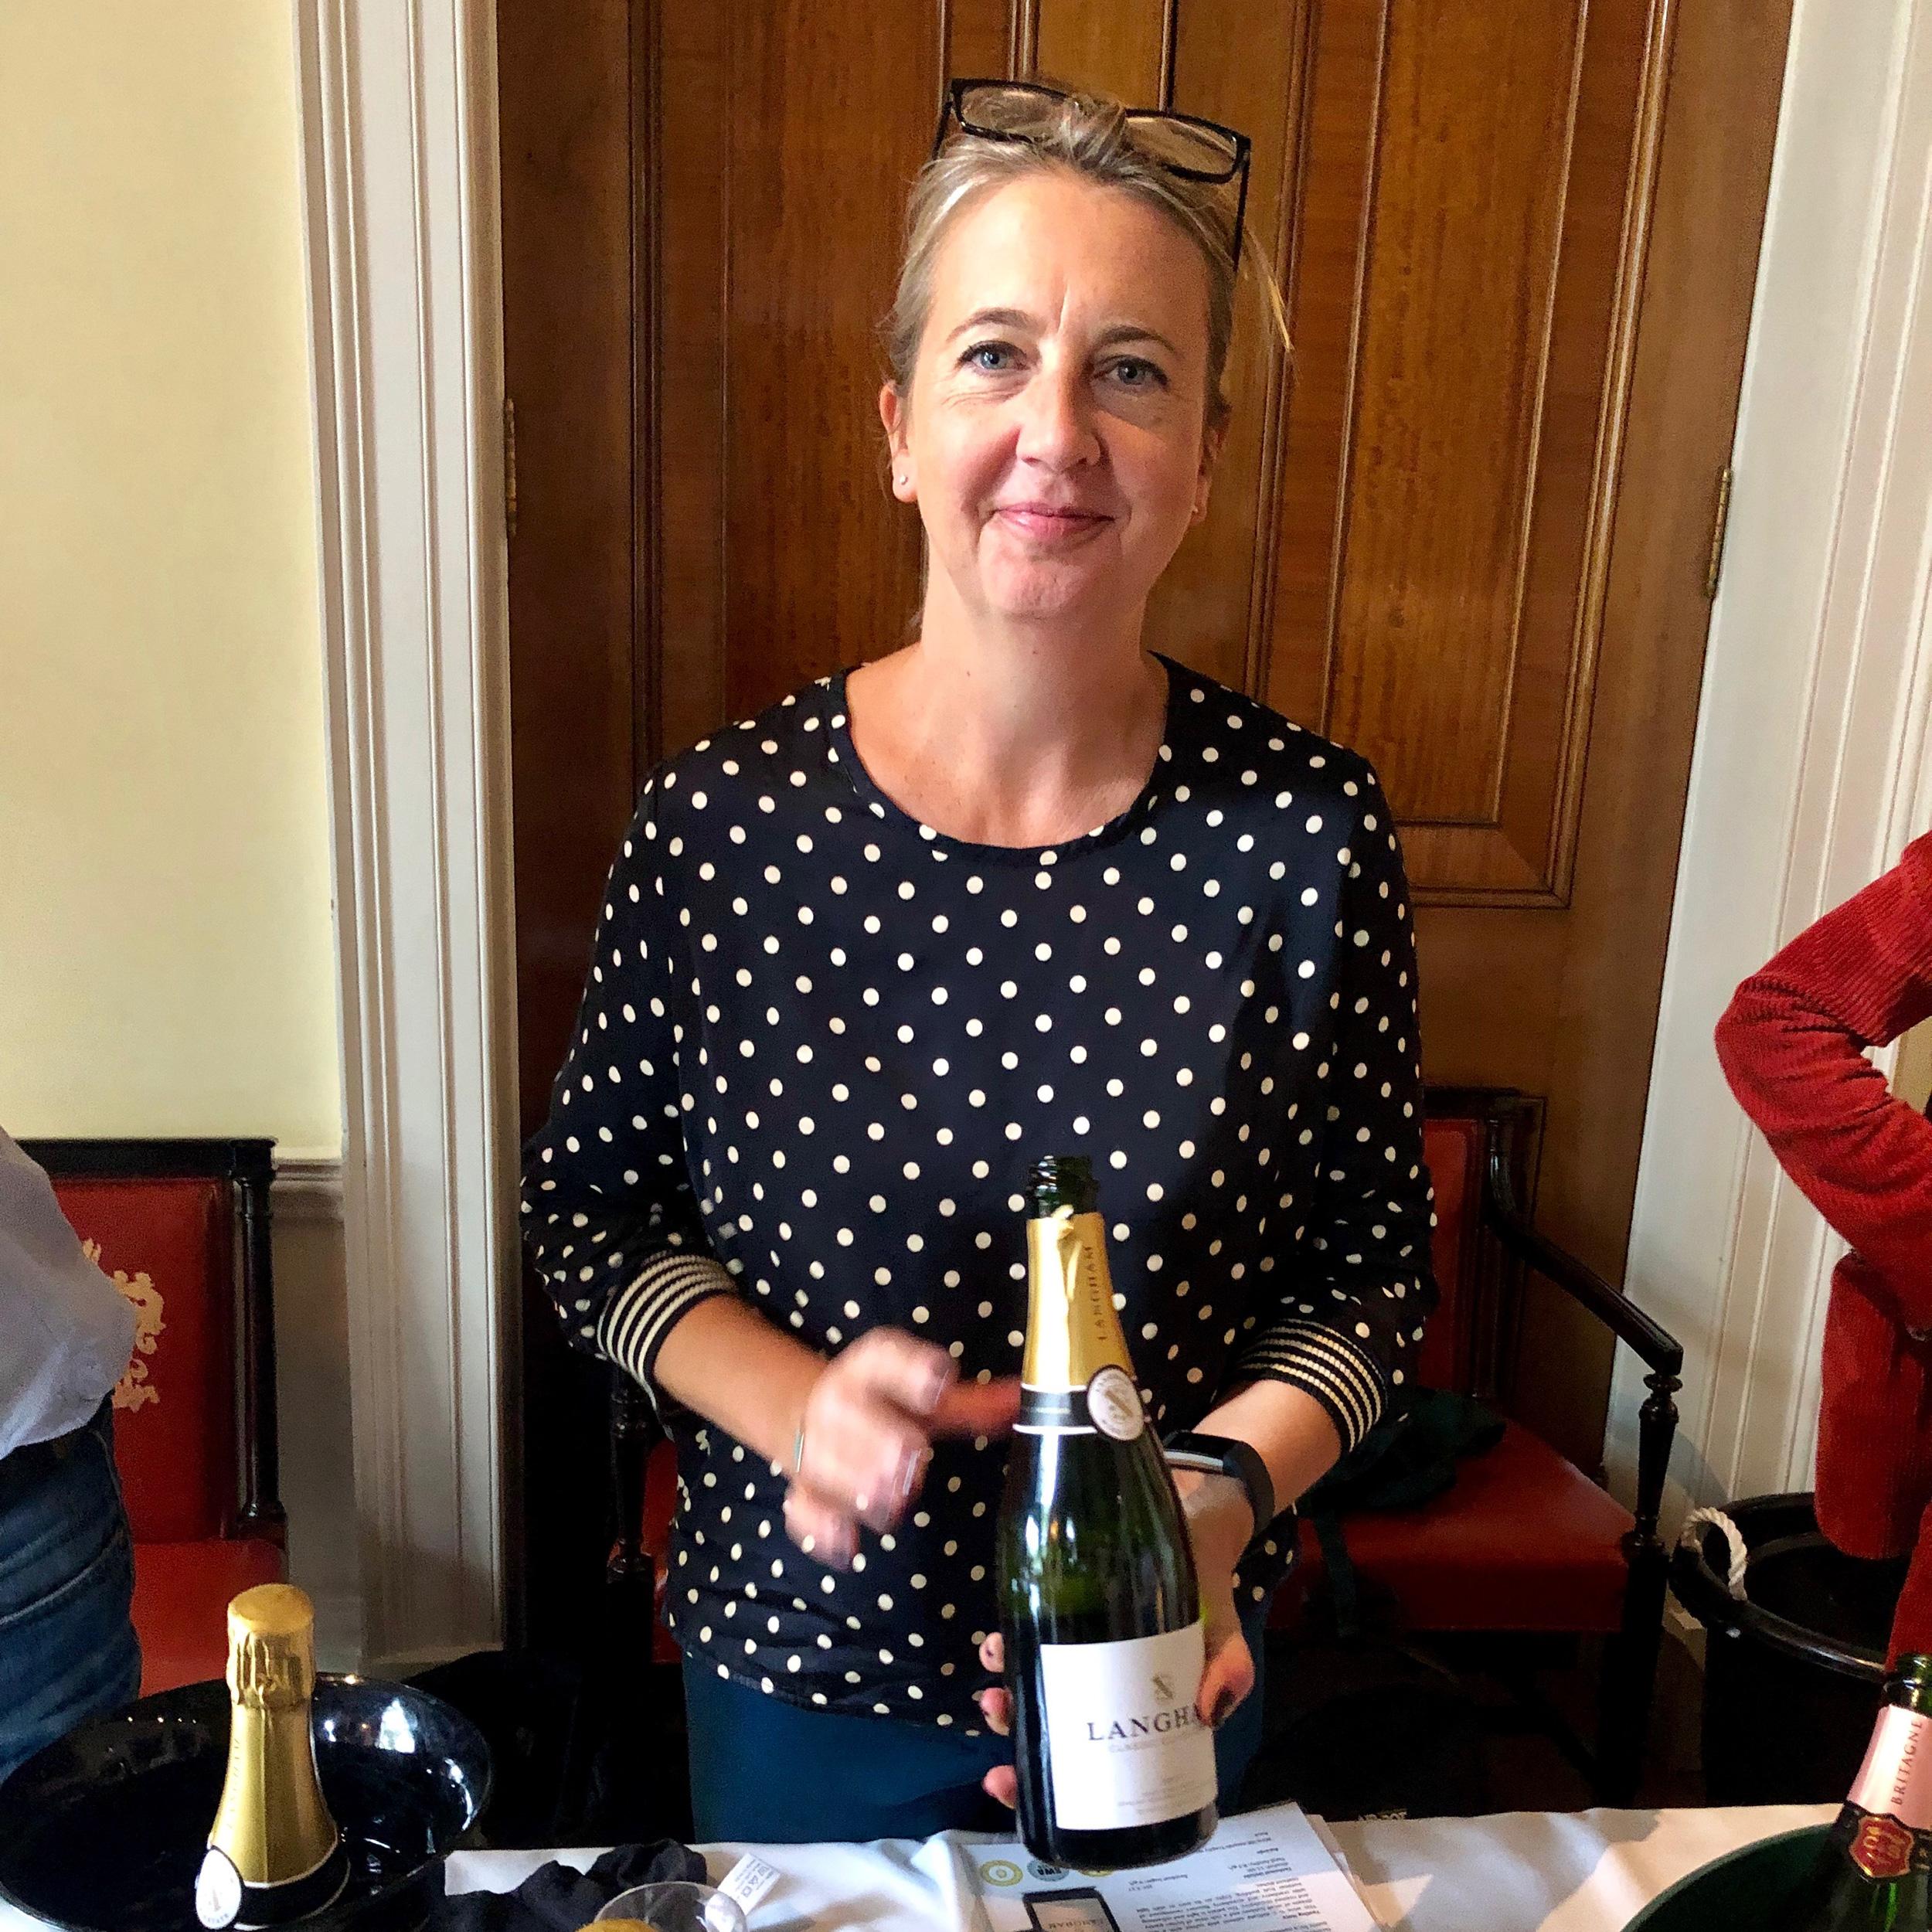 Caroline Gitsham from Langham